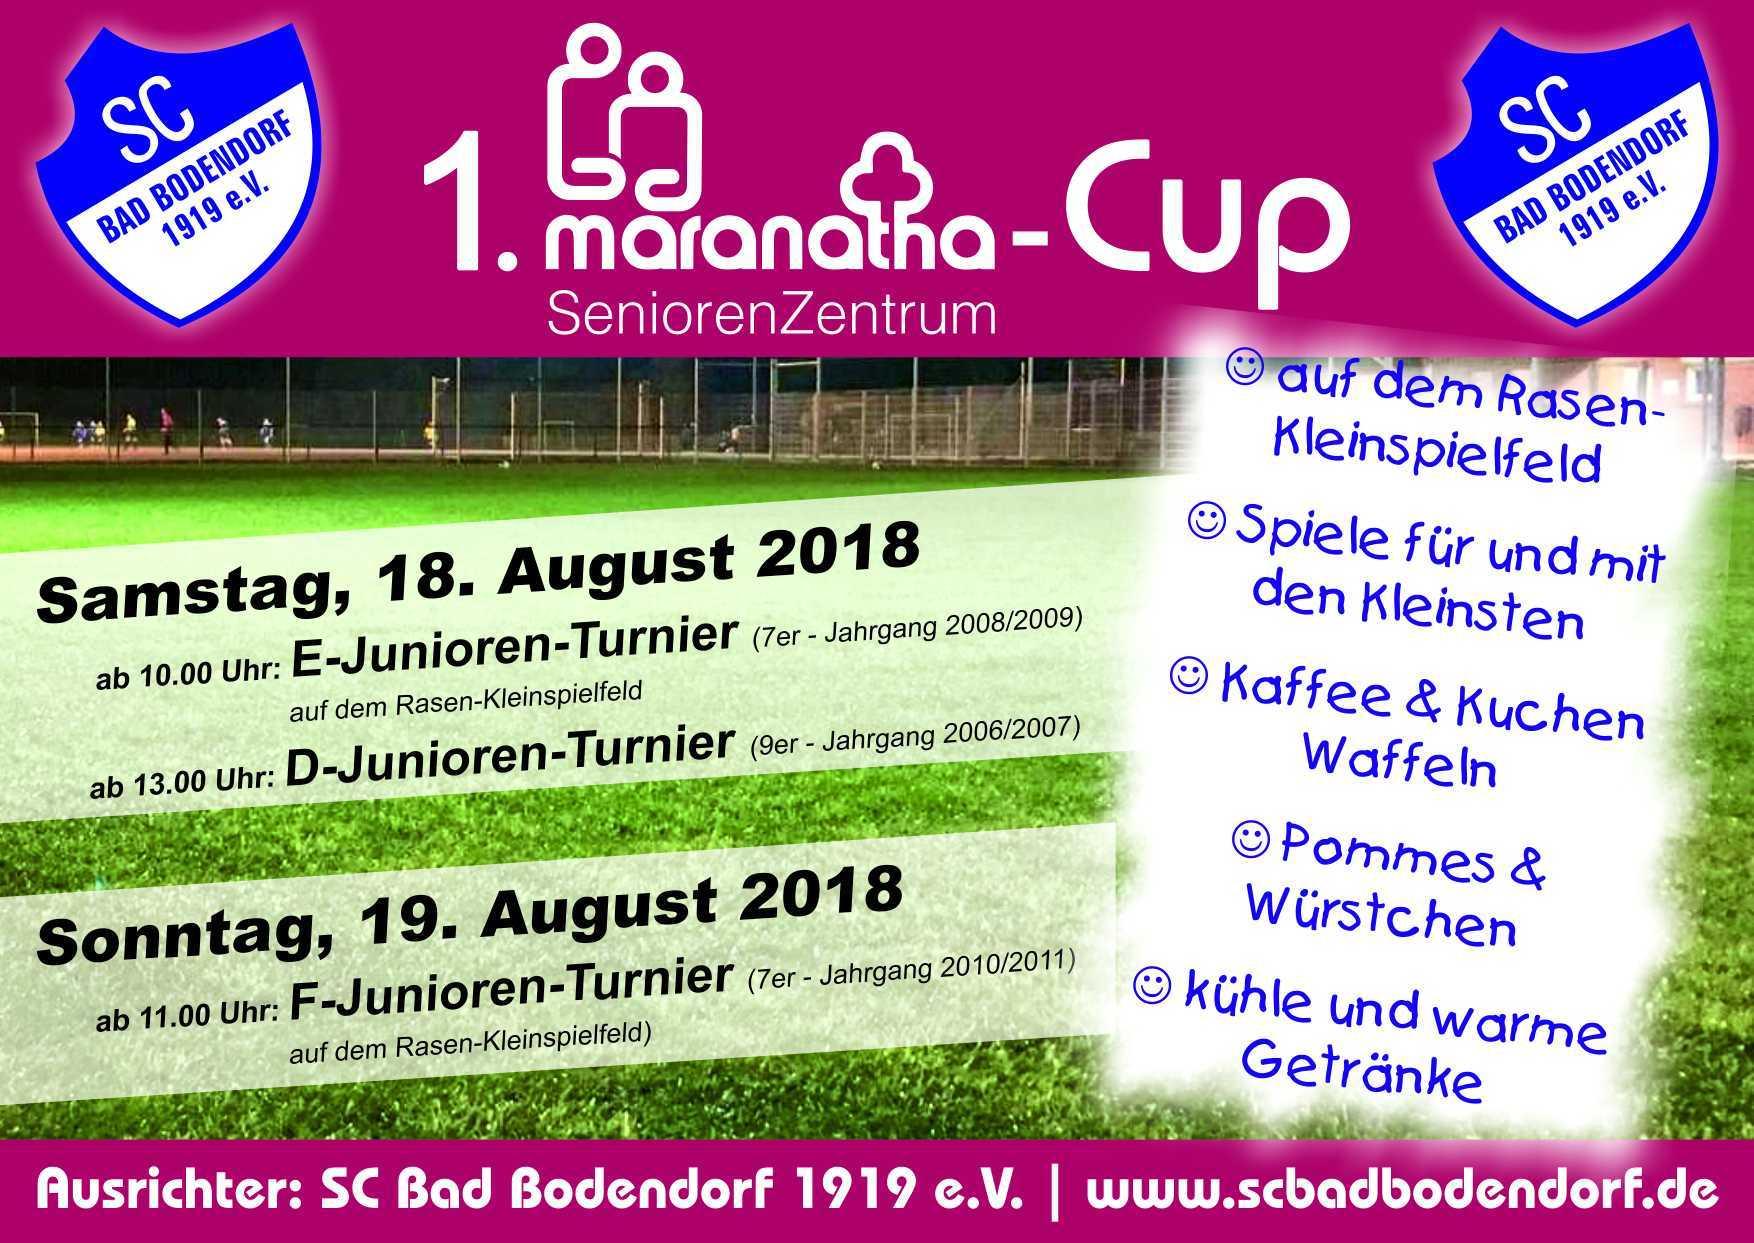 1 Maranatha Cup 18 190818 120718